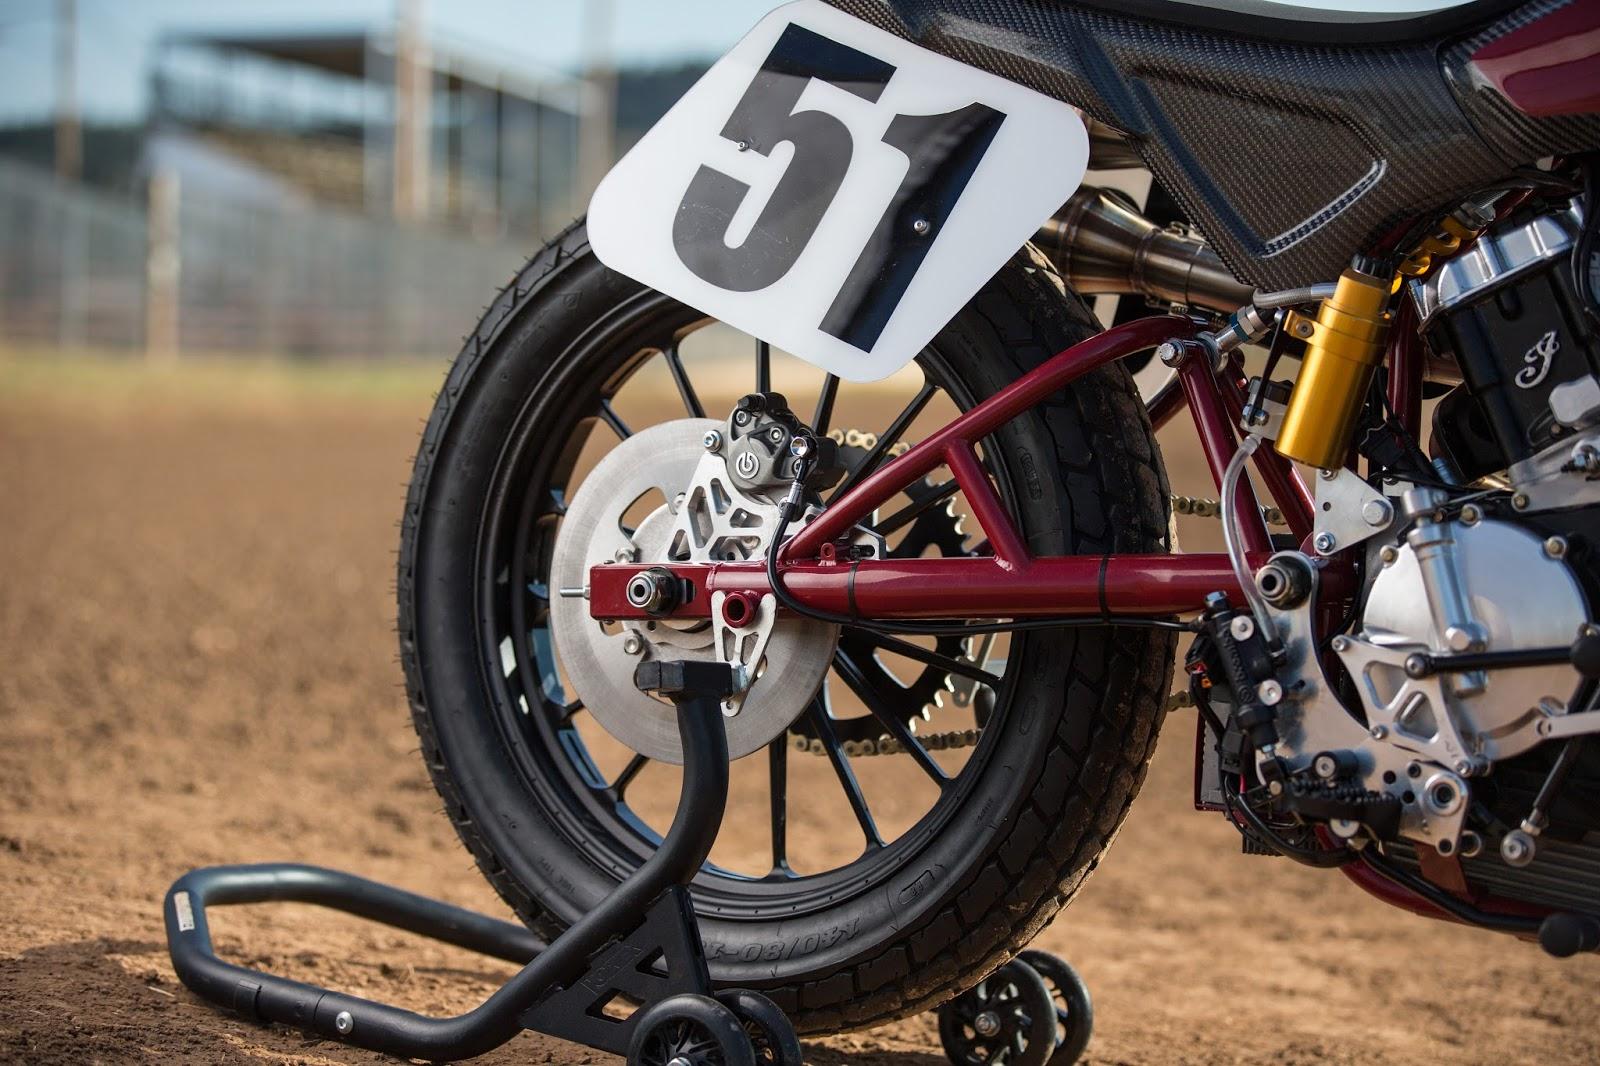 Racing Caf U00e8  Indian Scout Ftr 750 Dirt Track 2016